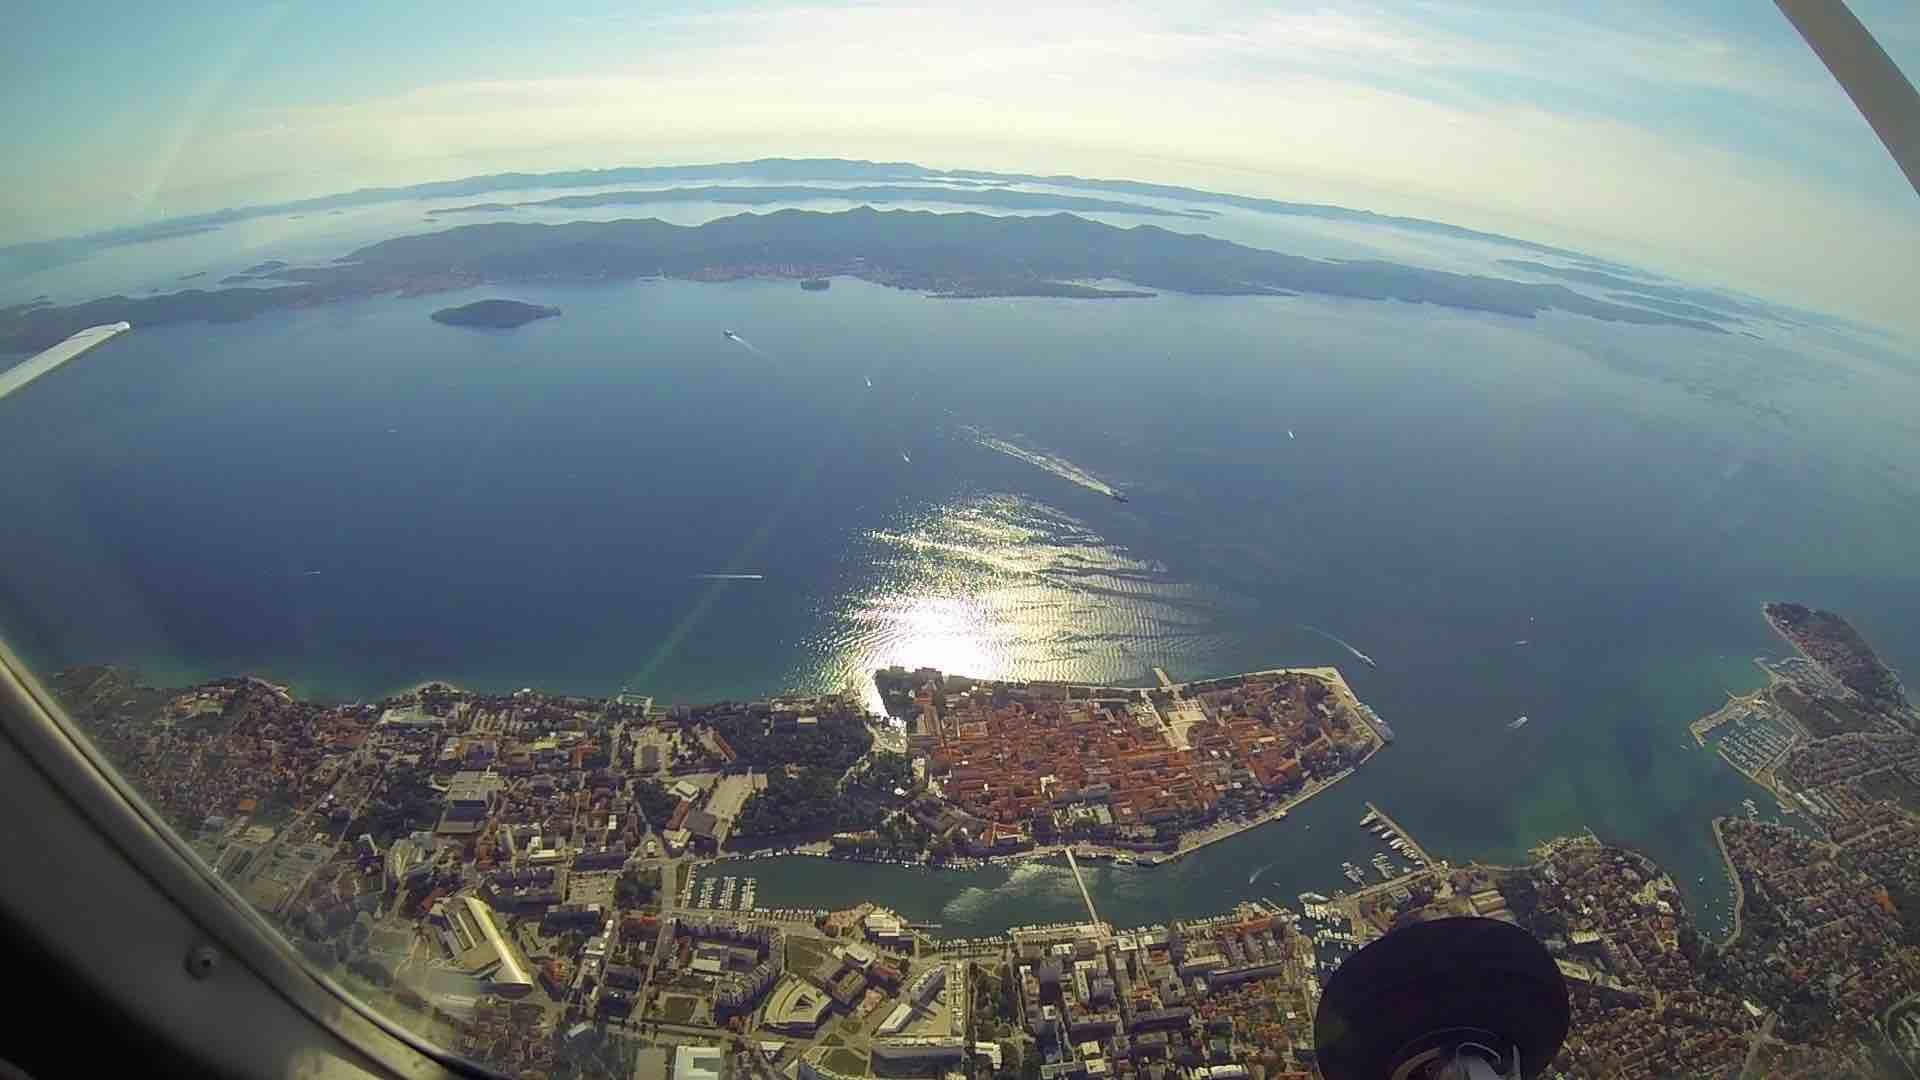 Skydiving above Zadar in Croatia